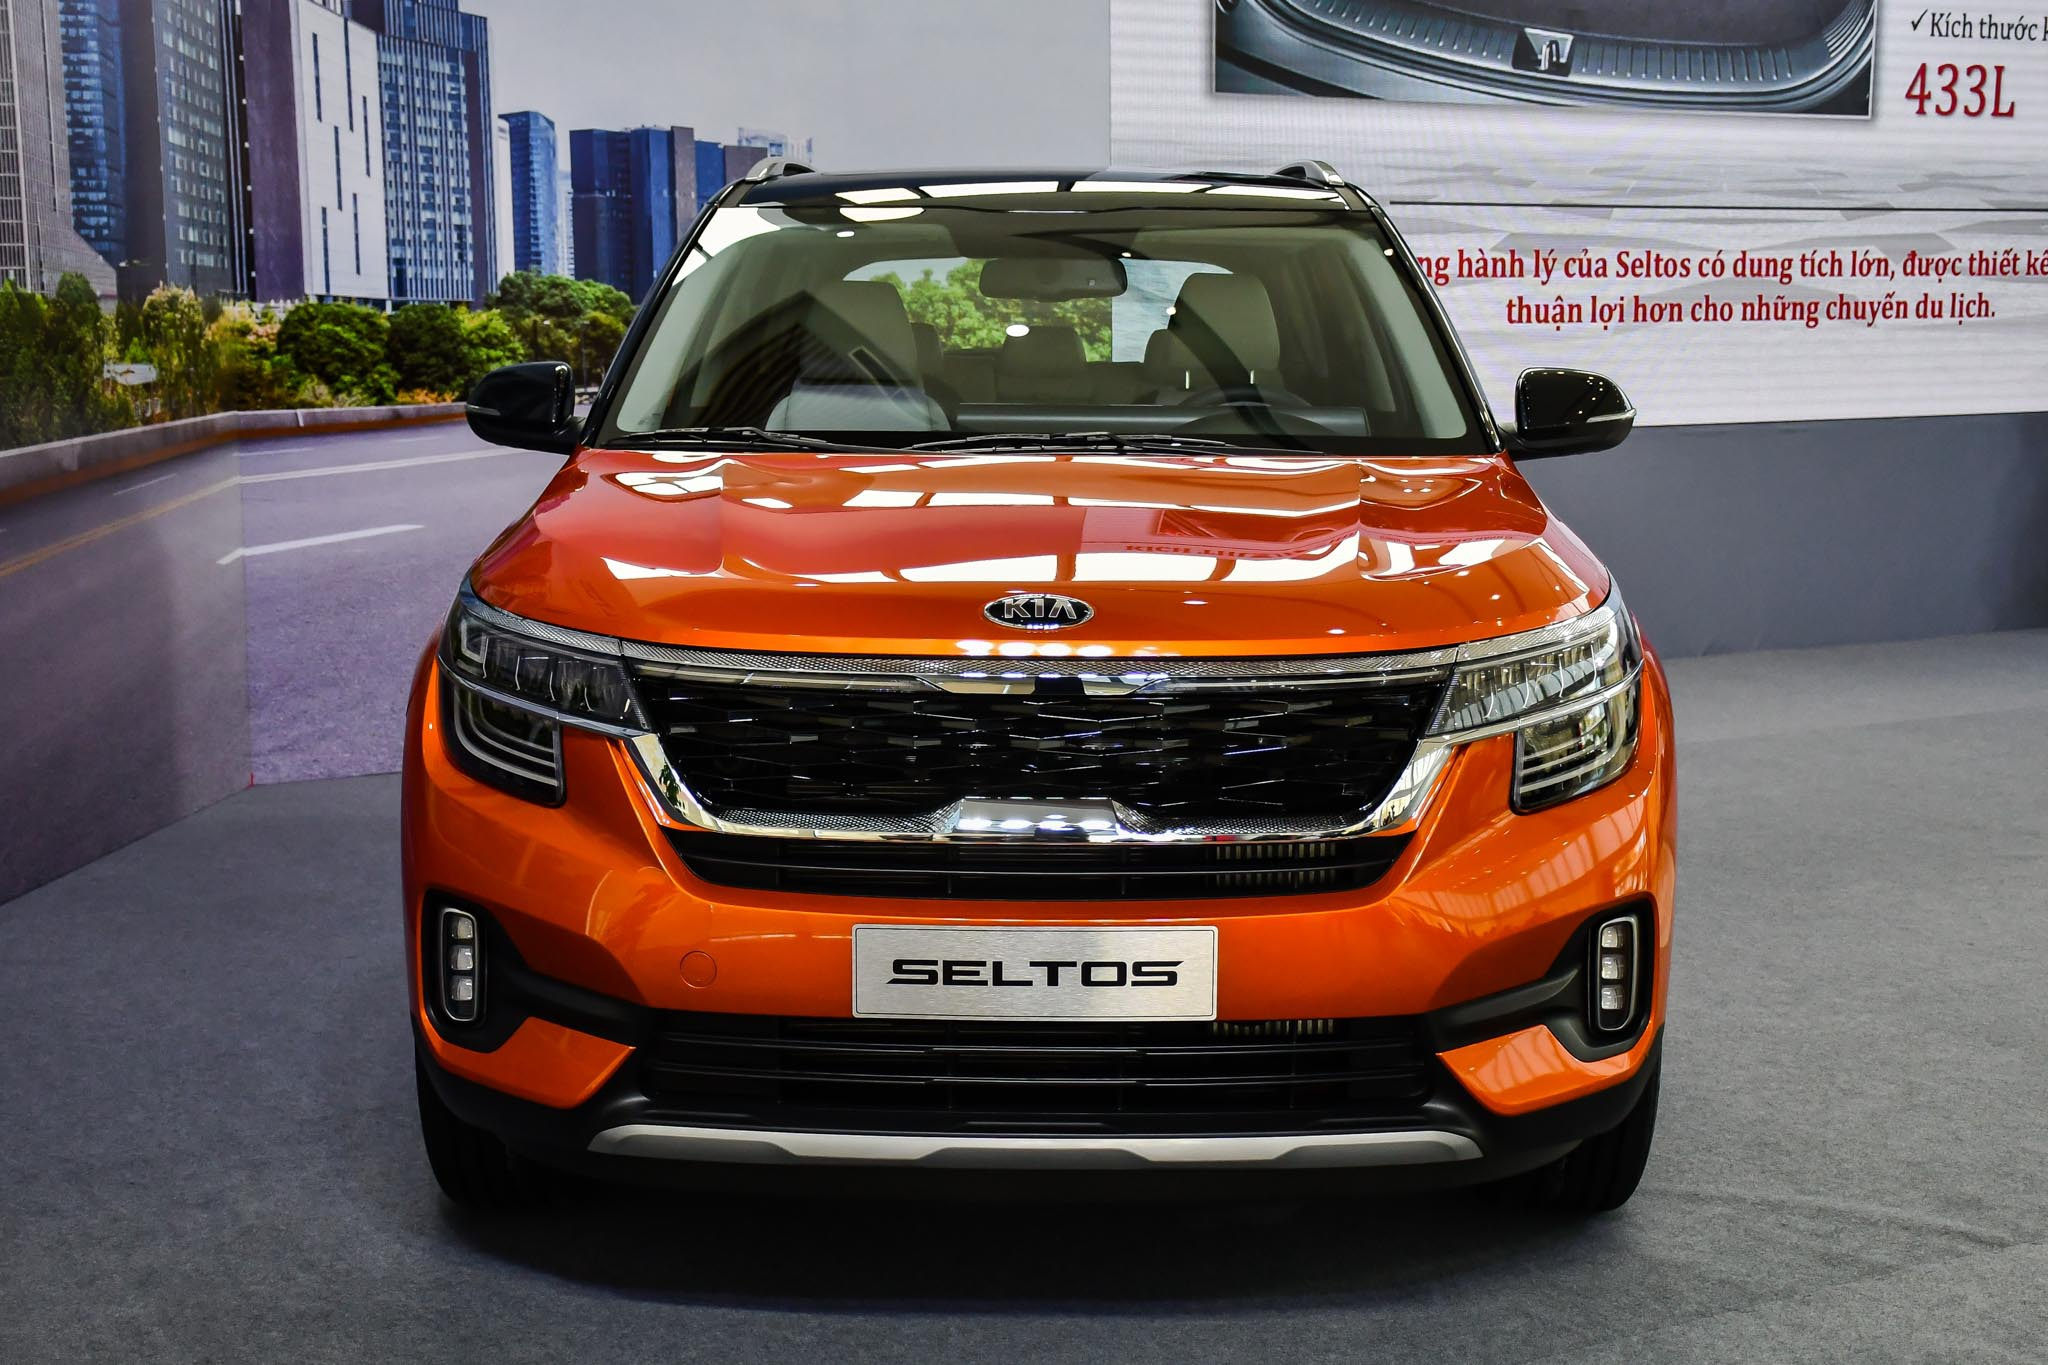 Chon Kia Seltos 1.4 Premium hay Toyota Corolla Cross 1.8V? anh 4